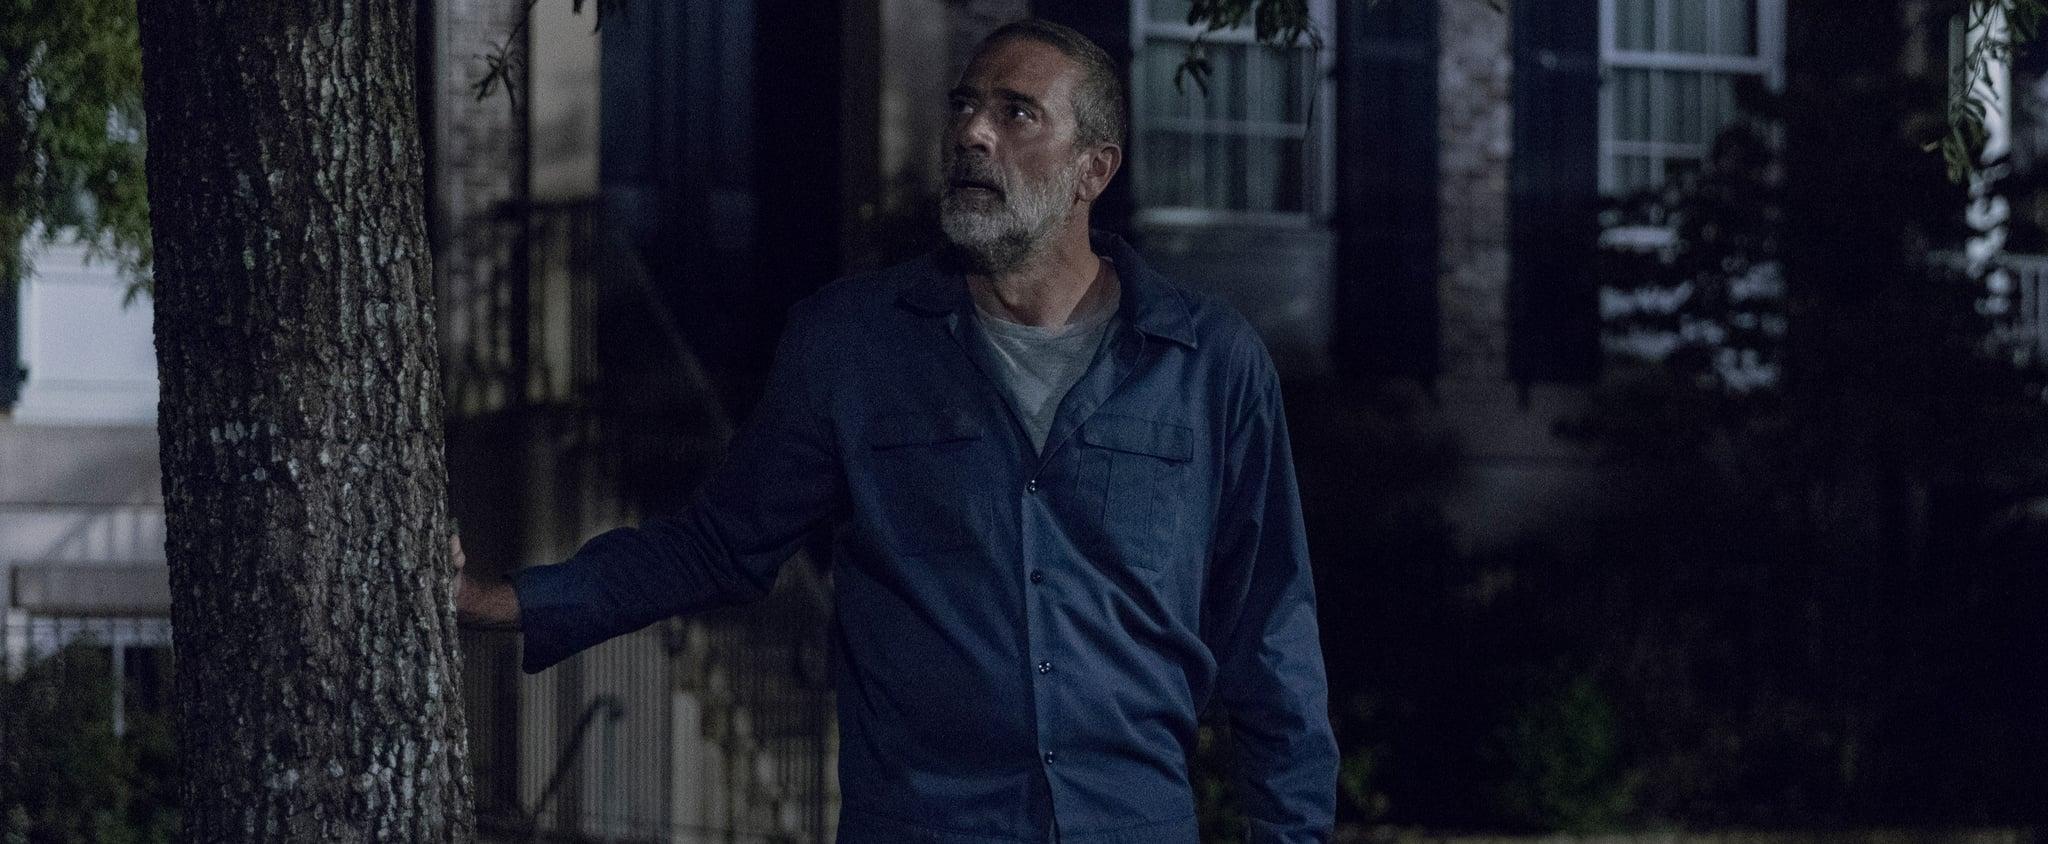 the walking dead season 7 parents guide